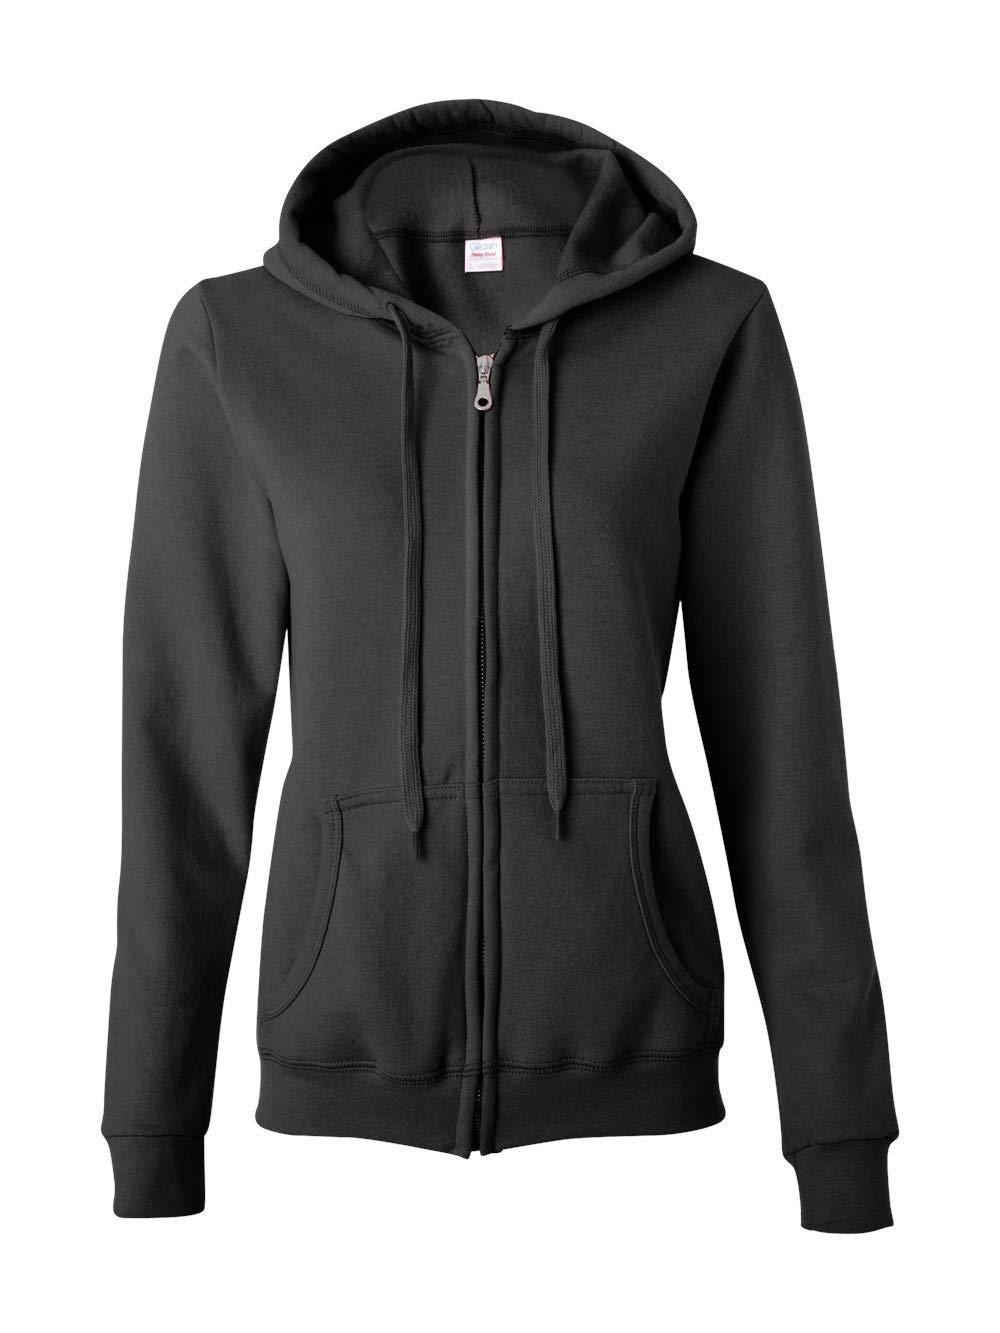 Gildan Women's Heavy Blend Full-Zip Hooded Sweatshirt, Black, Large